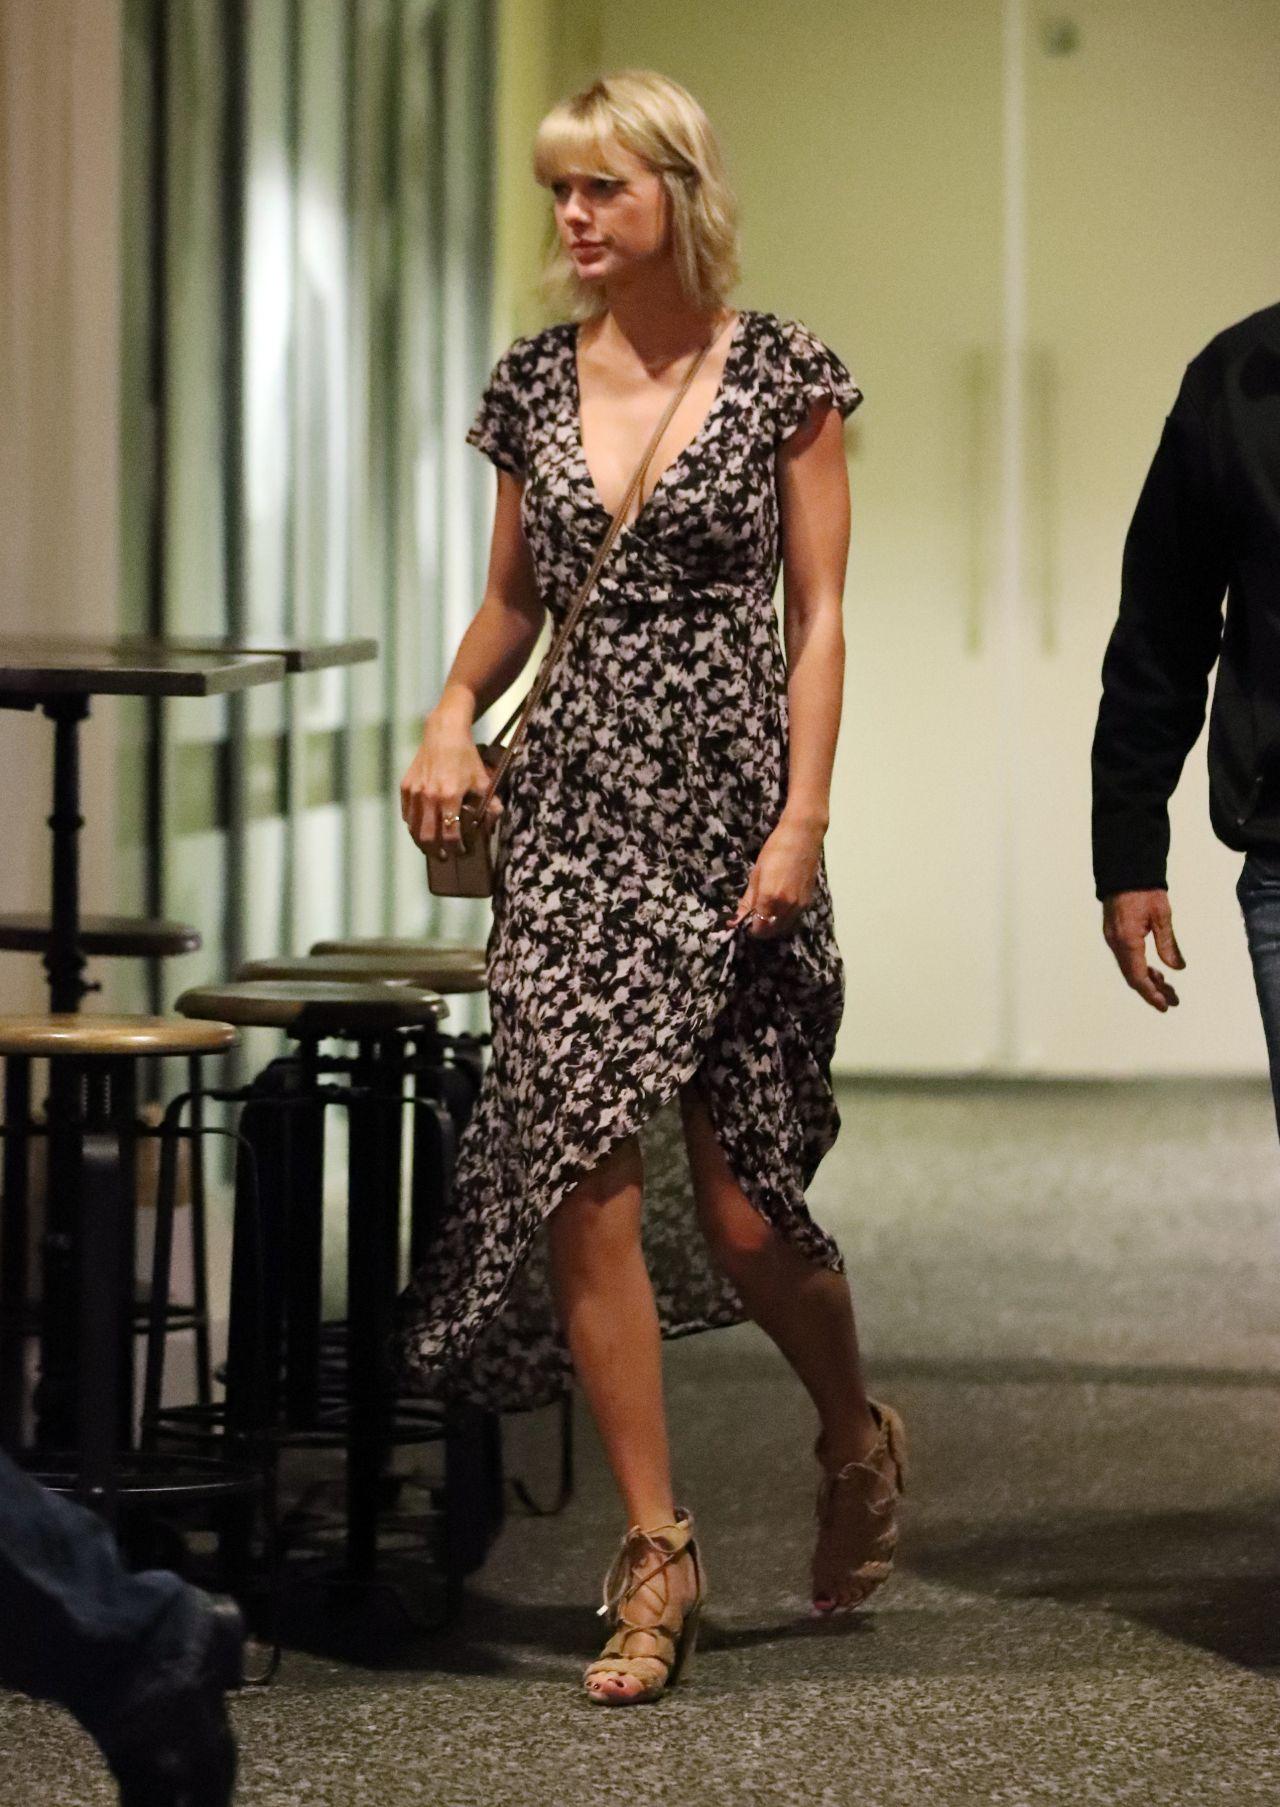 Taylor swift dating in Australia